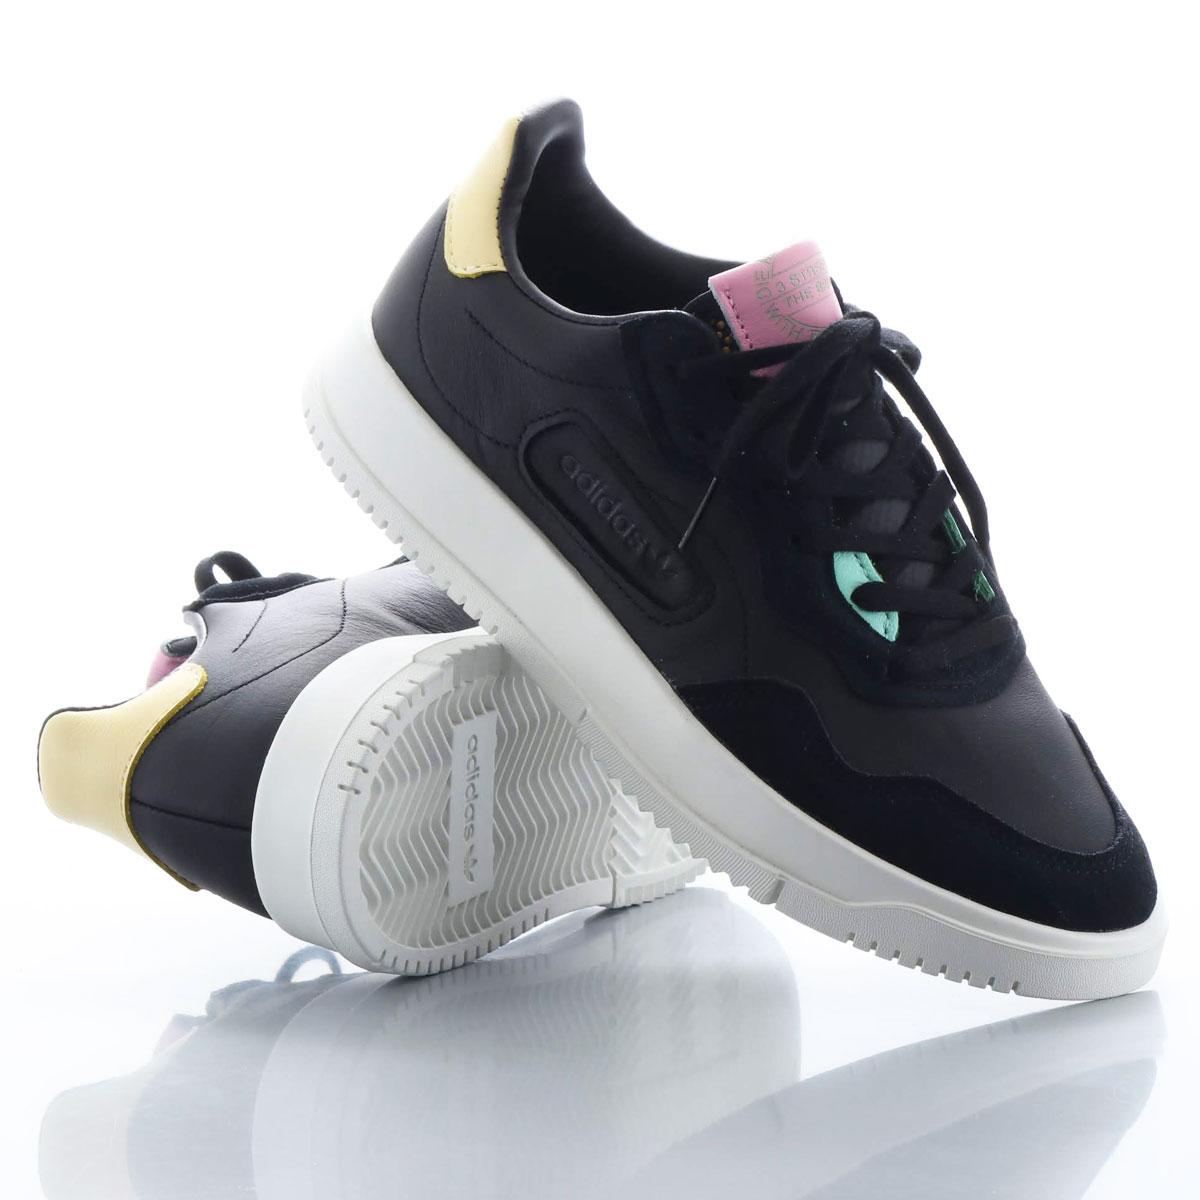 adidas SC PREMIERE(アディダス エスシー プレミア)CORE BLACK/CORE BLACK/EASY YELOW【メンズ レディース スニーカー】20SS-I